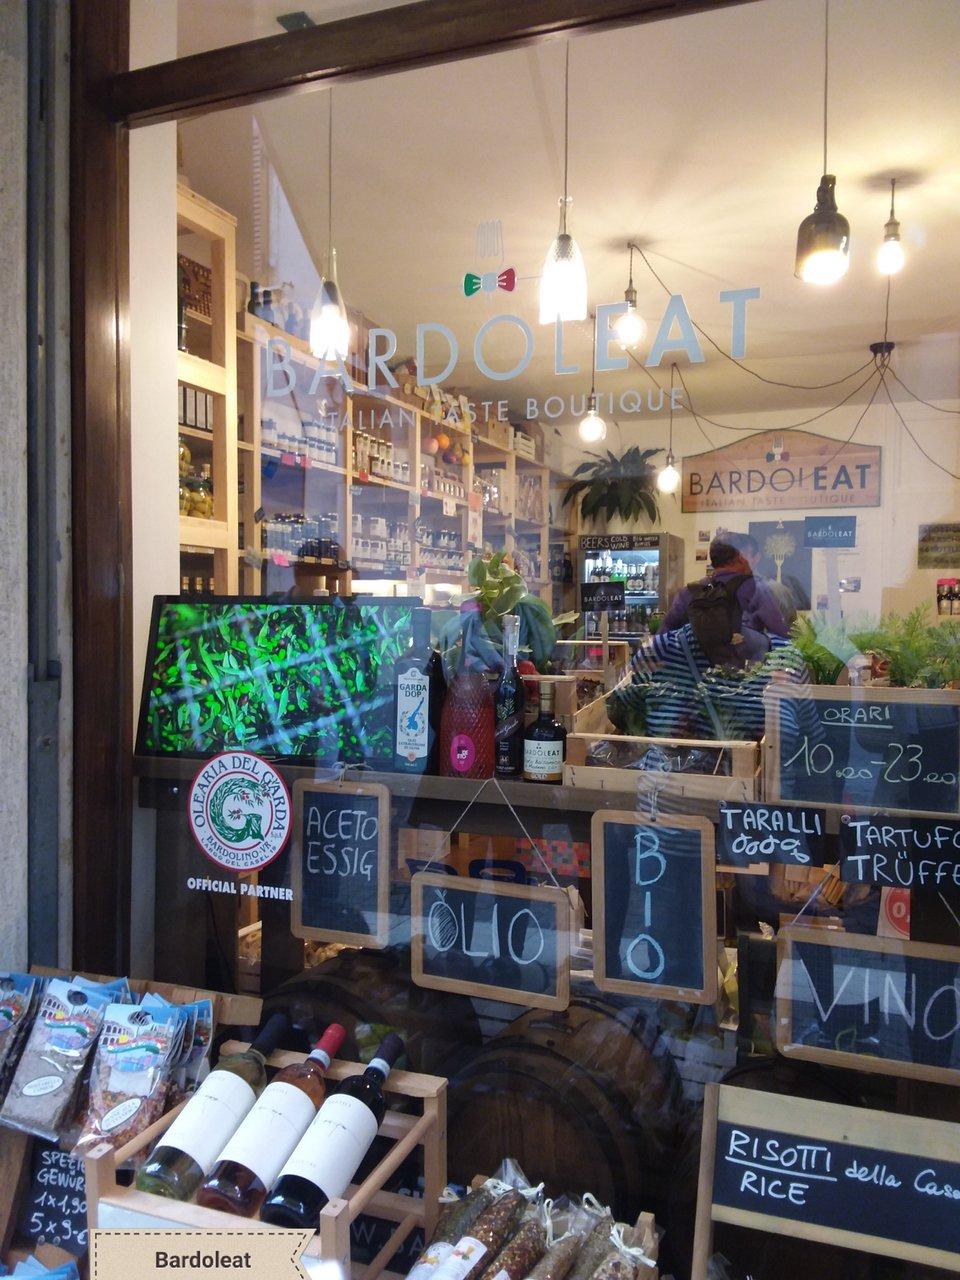 Corte San Luca Bardolino bardoleat (bardolino) - 2020 all you need to know before you